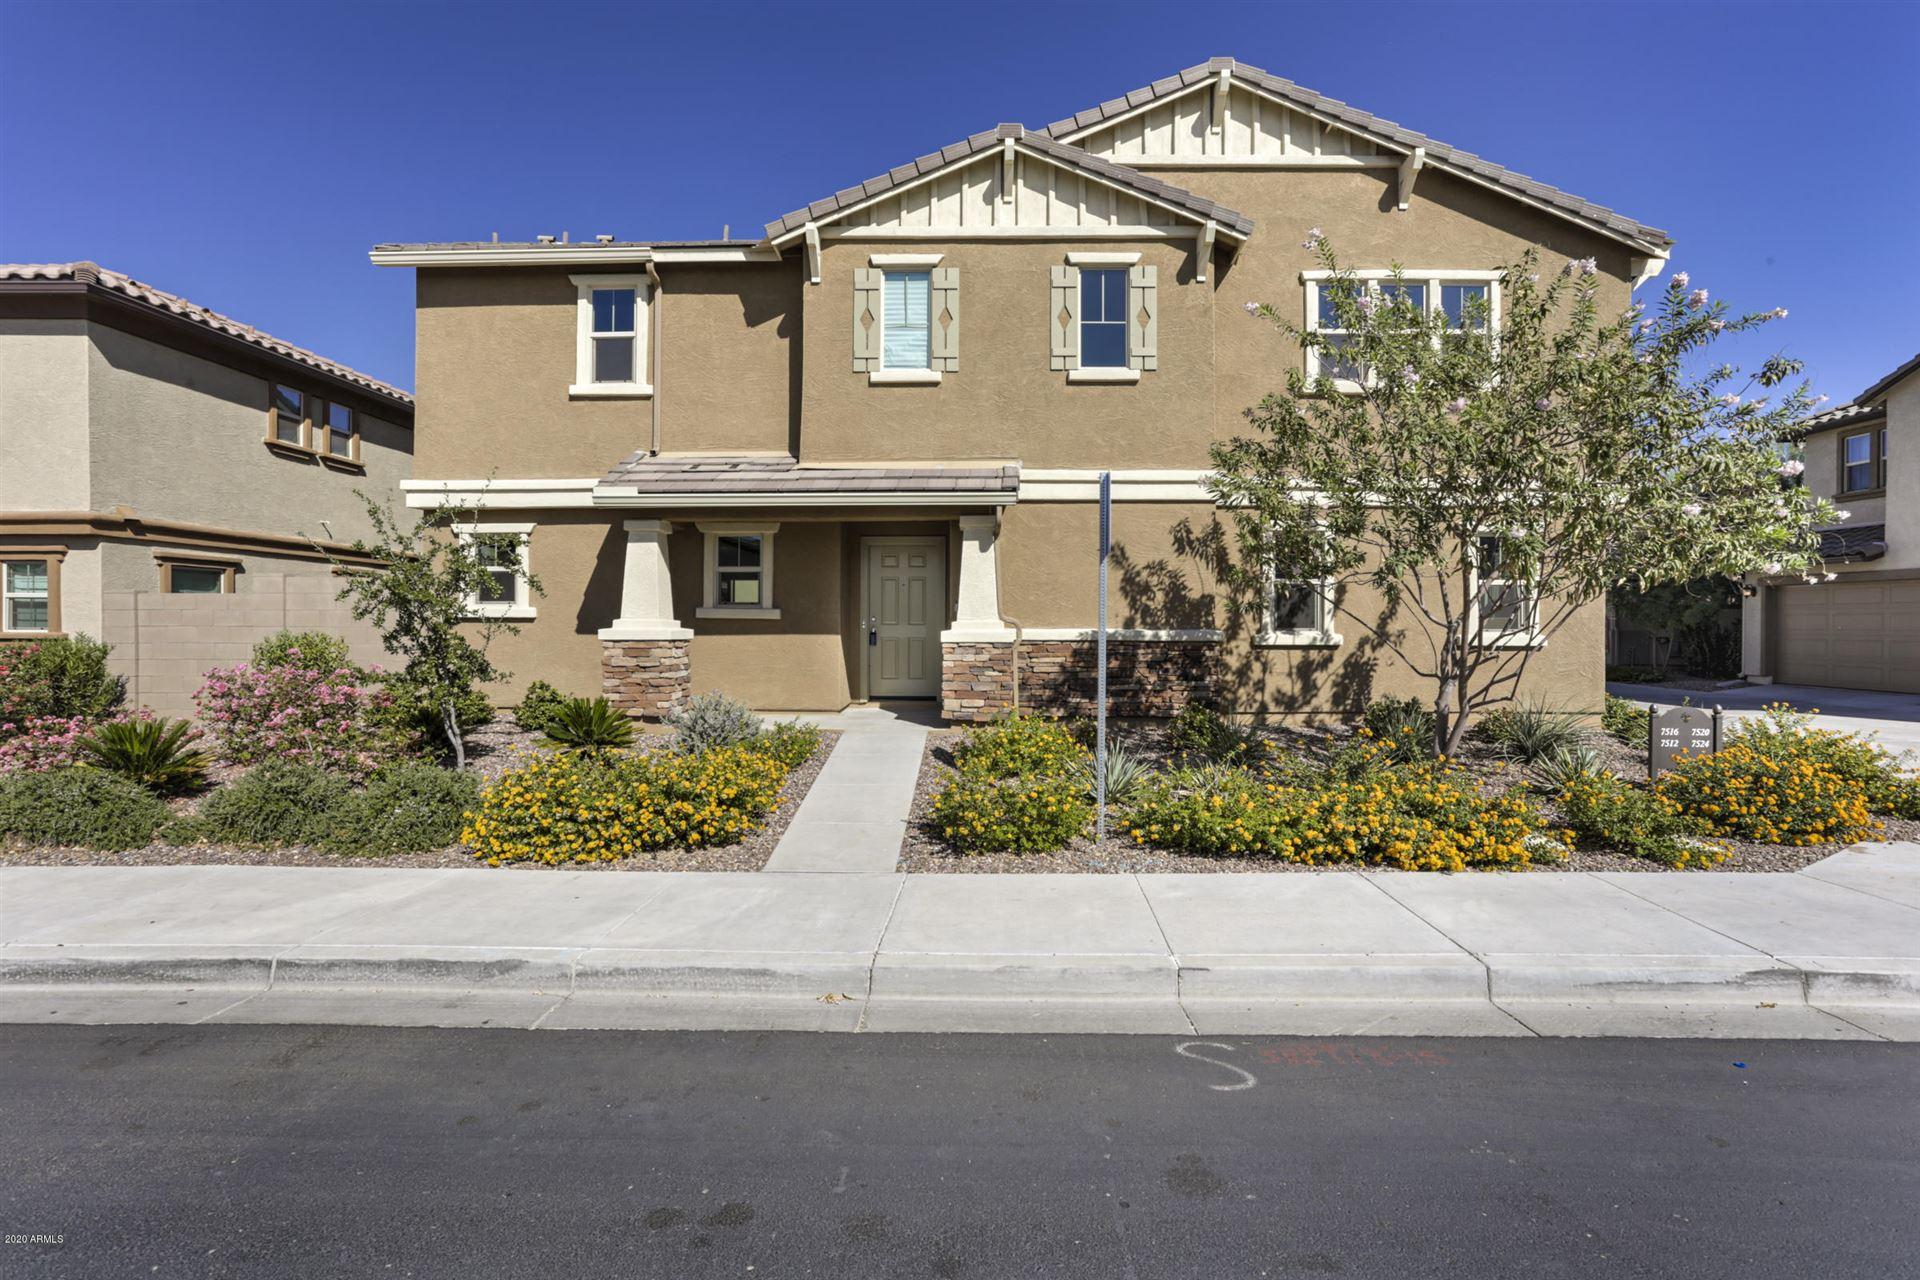 Photo for 7512 E Flower Avenue, Mesa, AZ 85208 (MLS # 6149983)